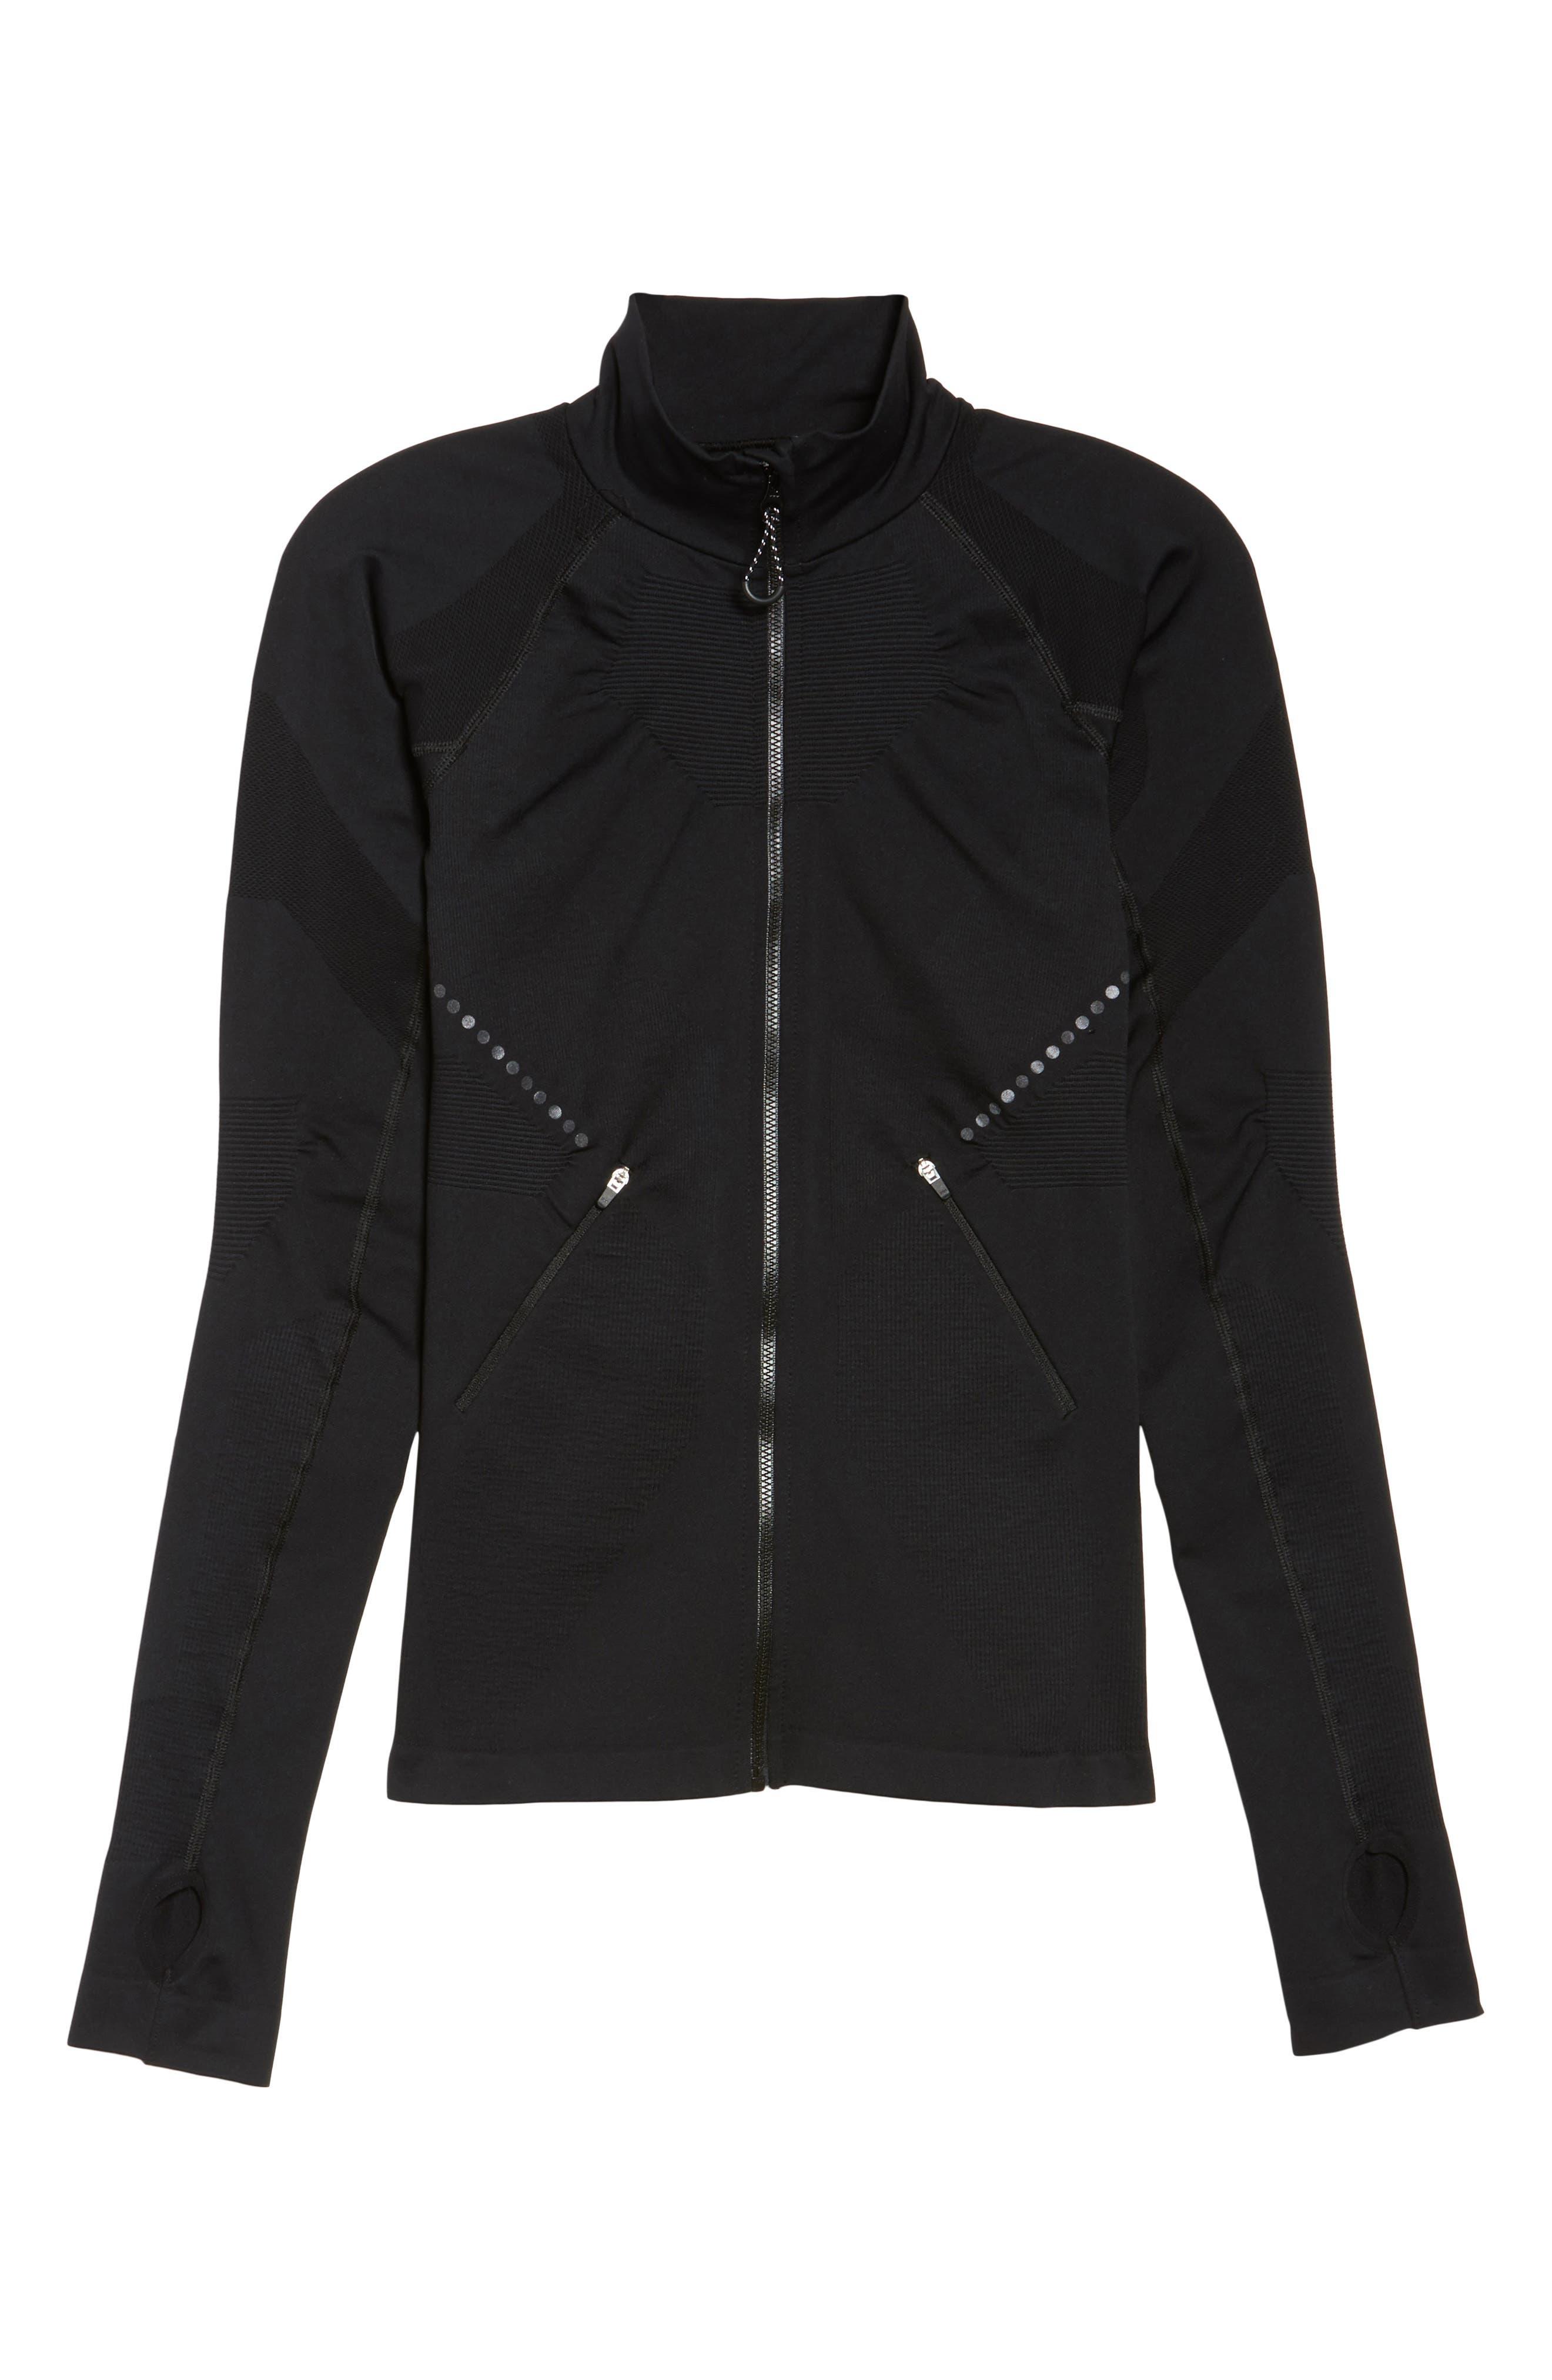 Blackout Jacket,                             Alternate thumbnail 7, color,                             Black